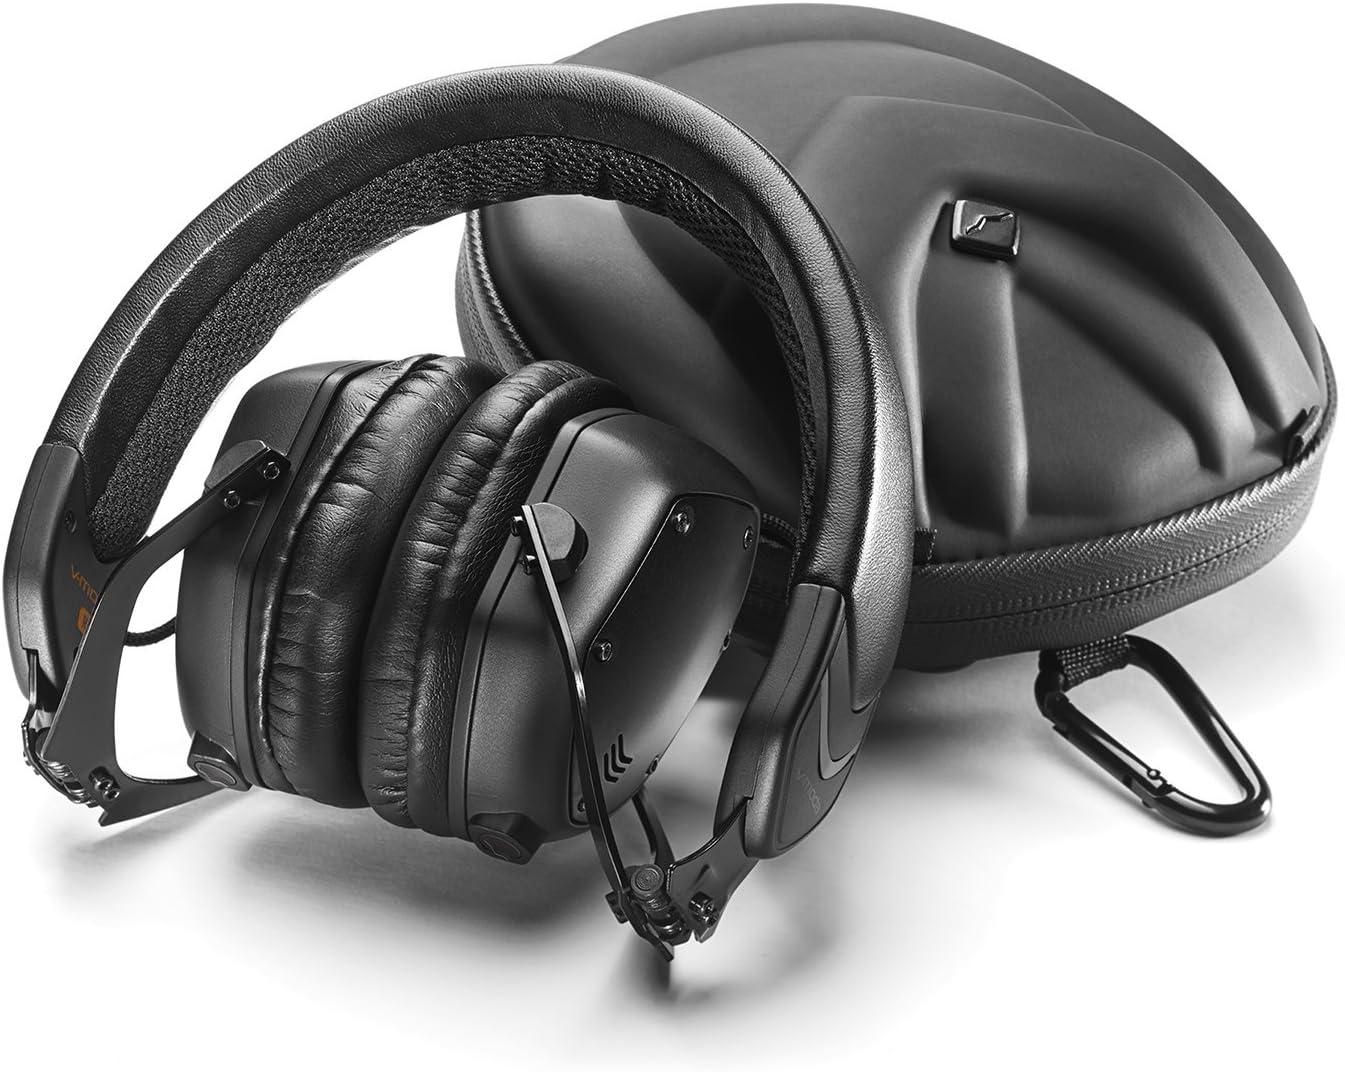 Matte Black V-MODA XS On-Ear Metal Noise-Isolating Headphones One Size  Musical Instruments & DJ Recording & Computer